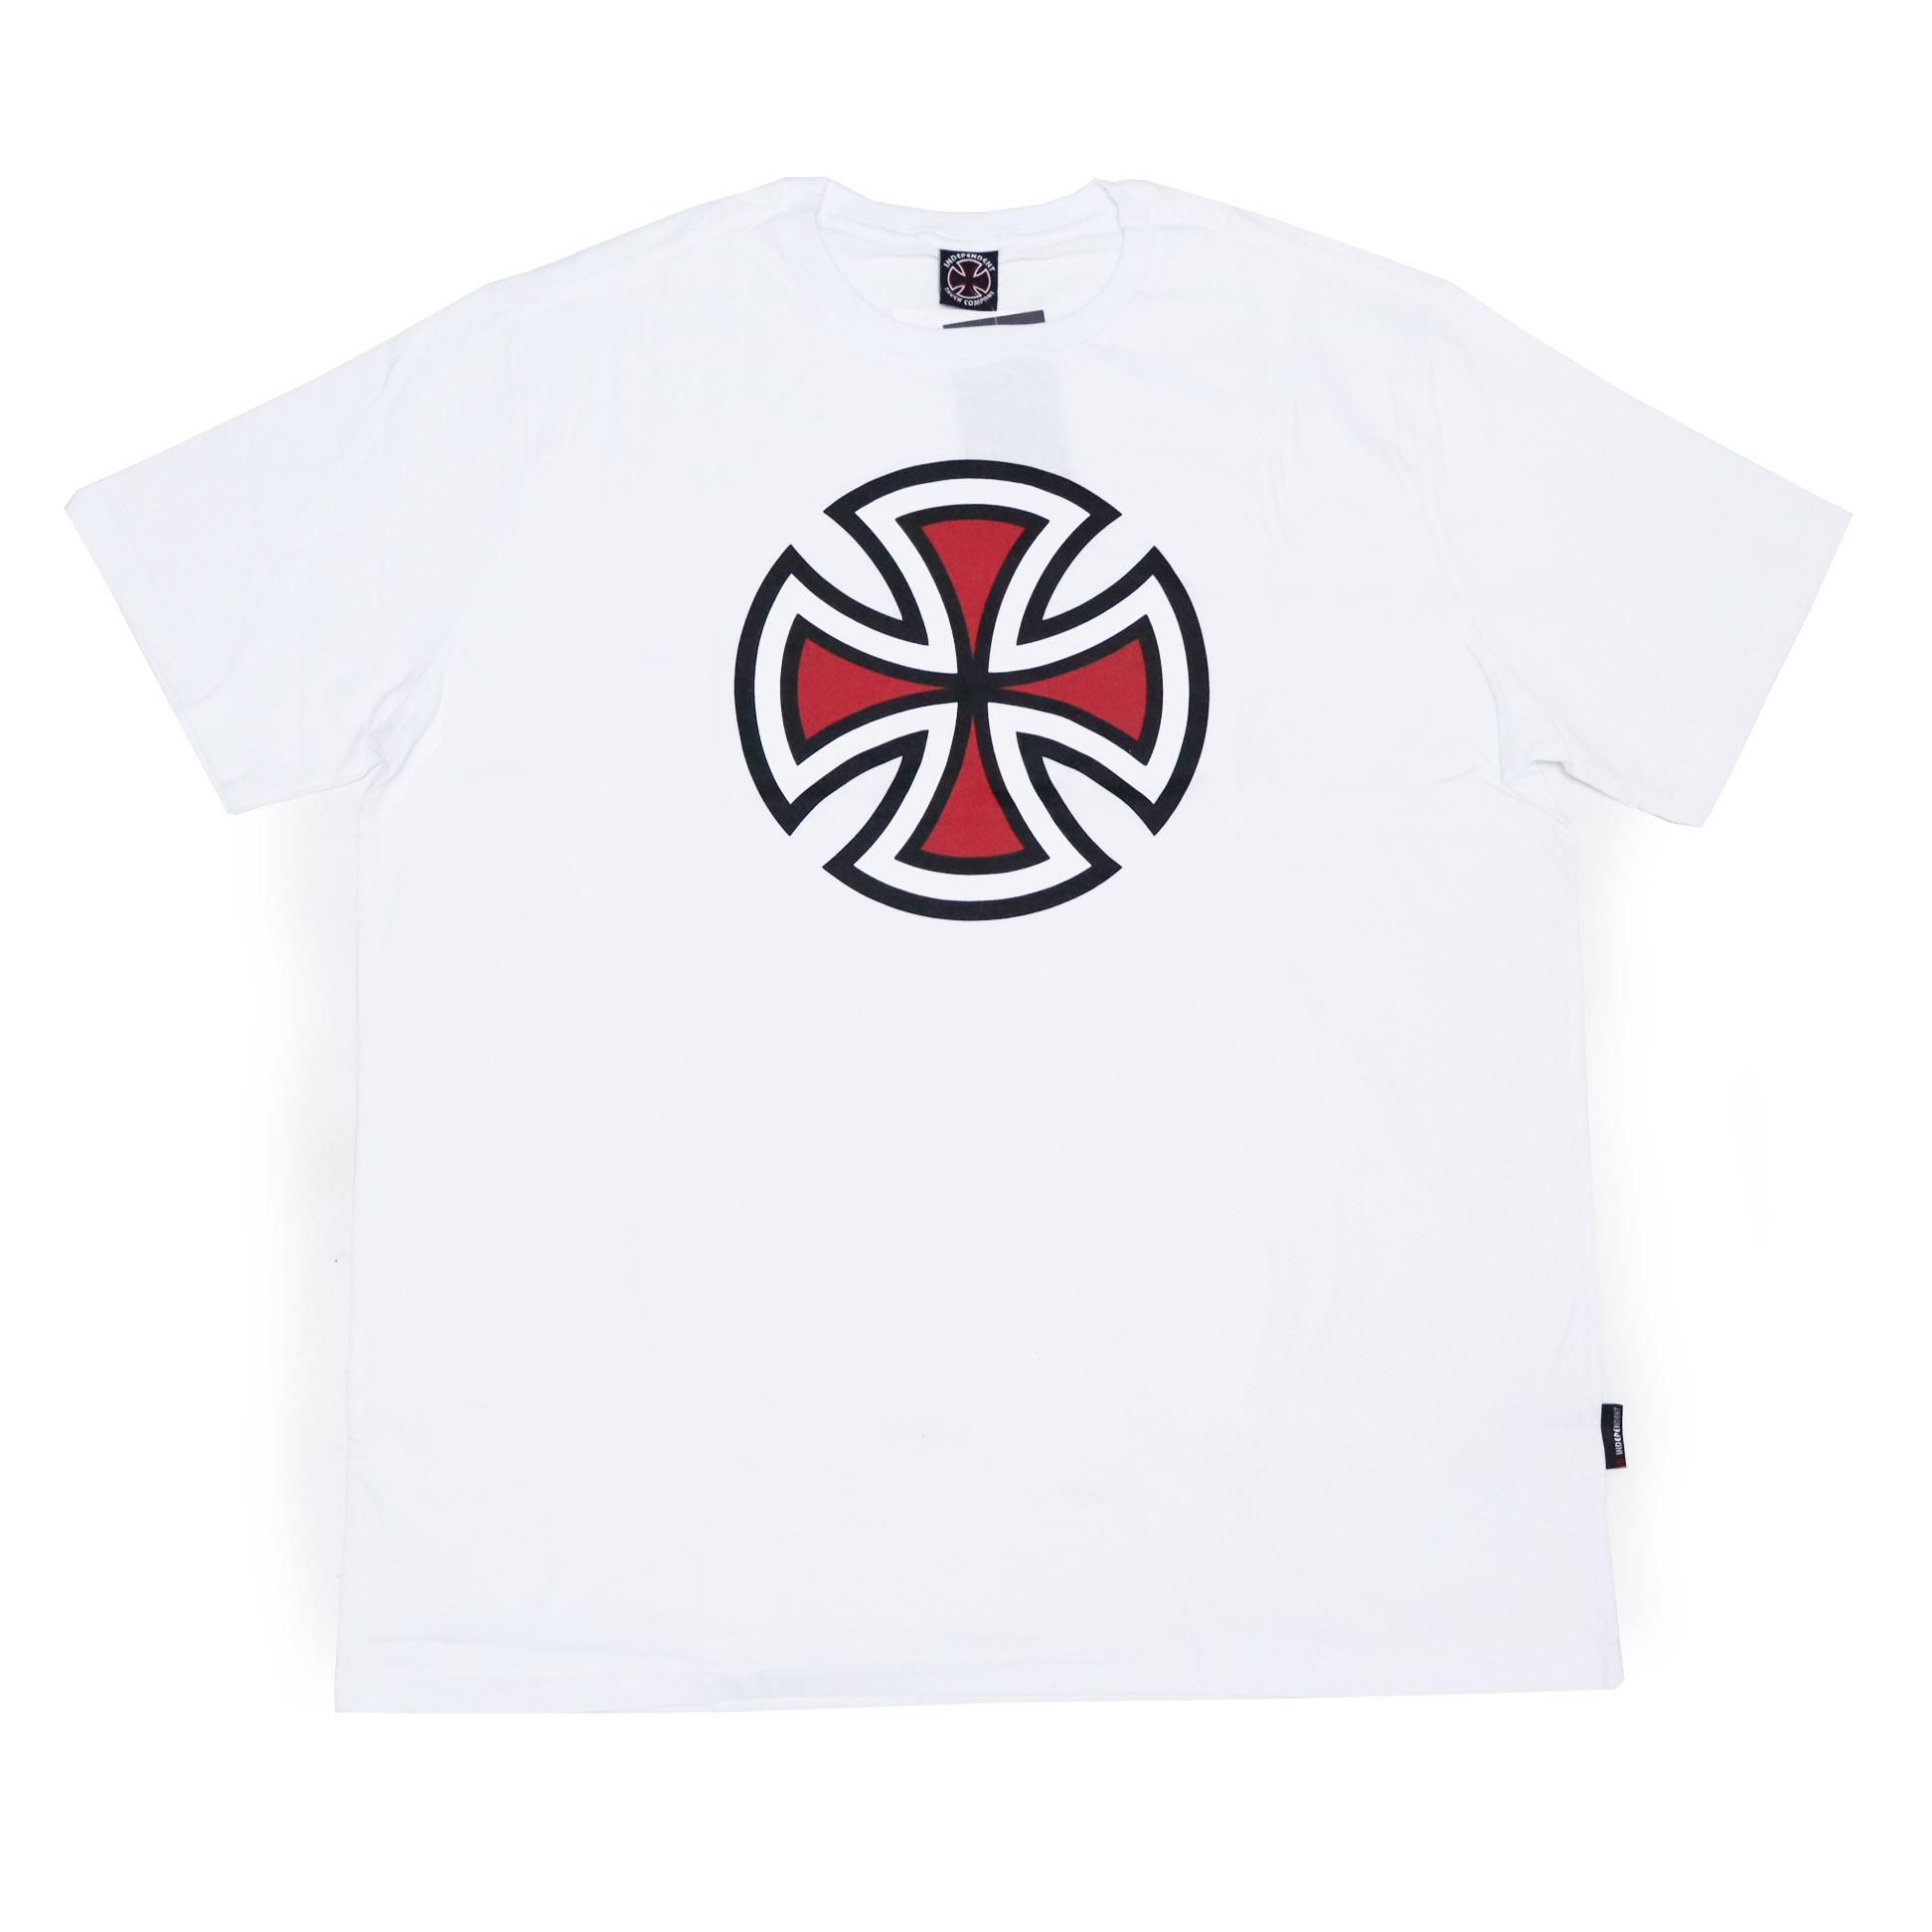 Camiseta Independent 4 Tier Cross 3 Color - Branco